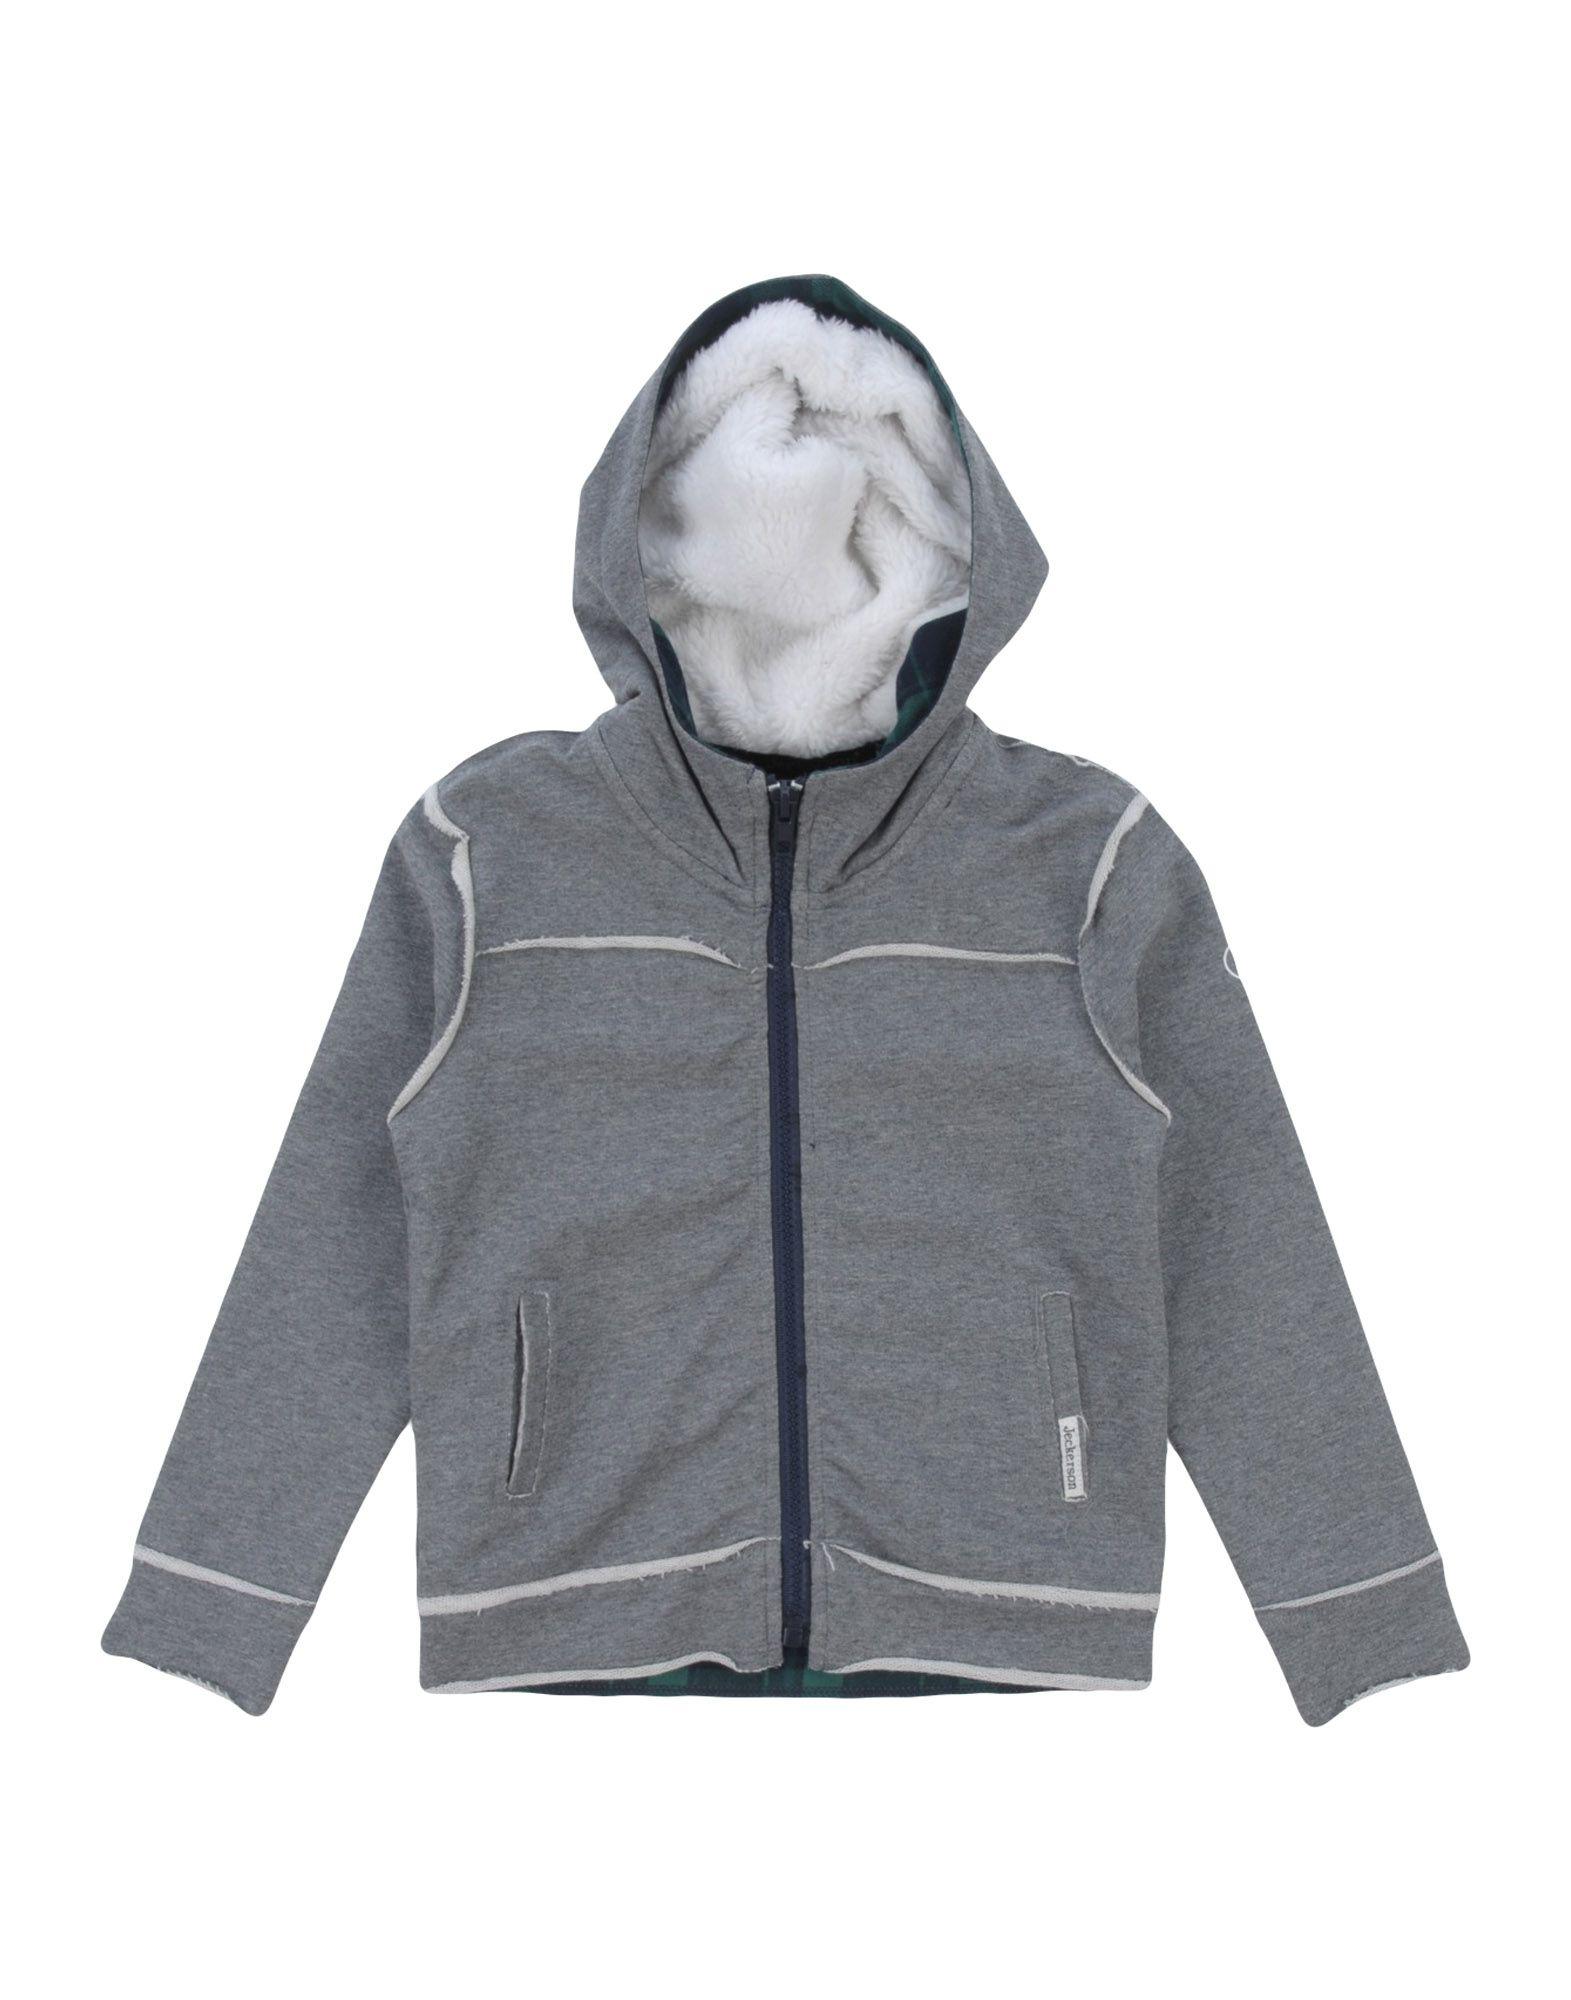 Vêtements Shirts Sweat 0 Et Jeckerson Coton Pulls Mois 24 Garçon x4zn1E